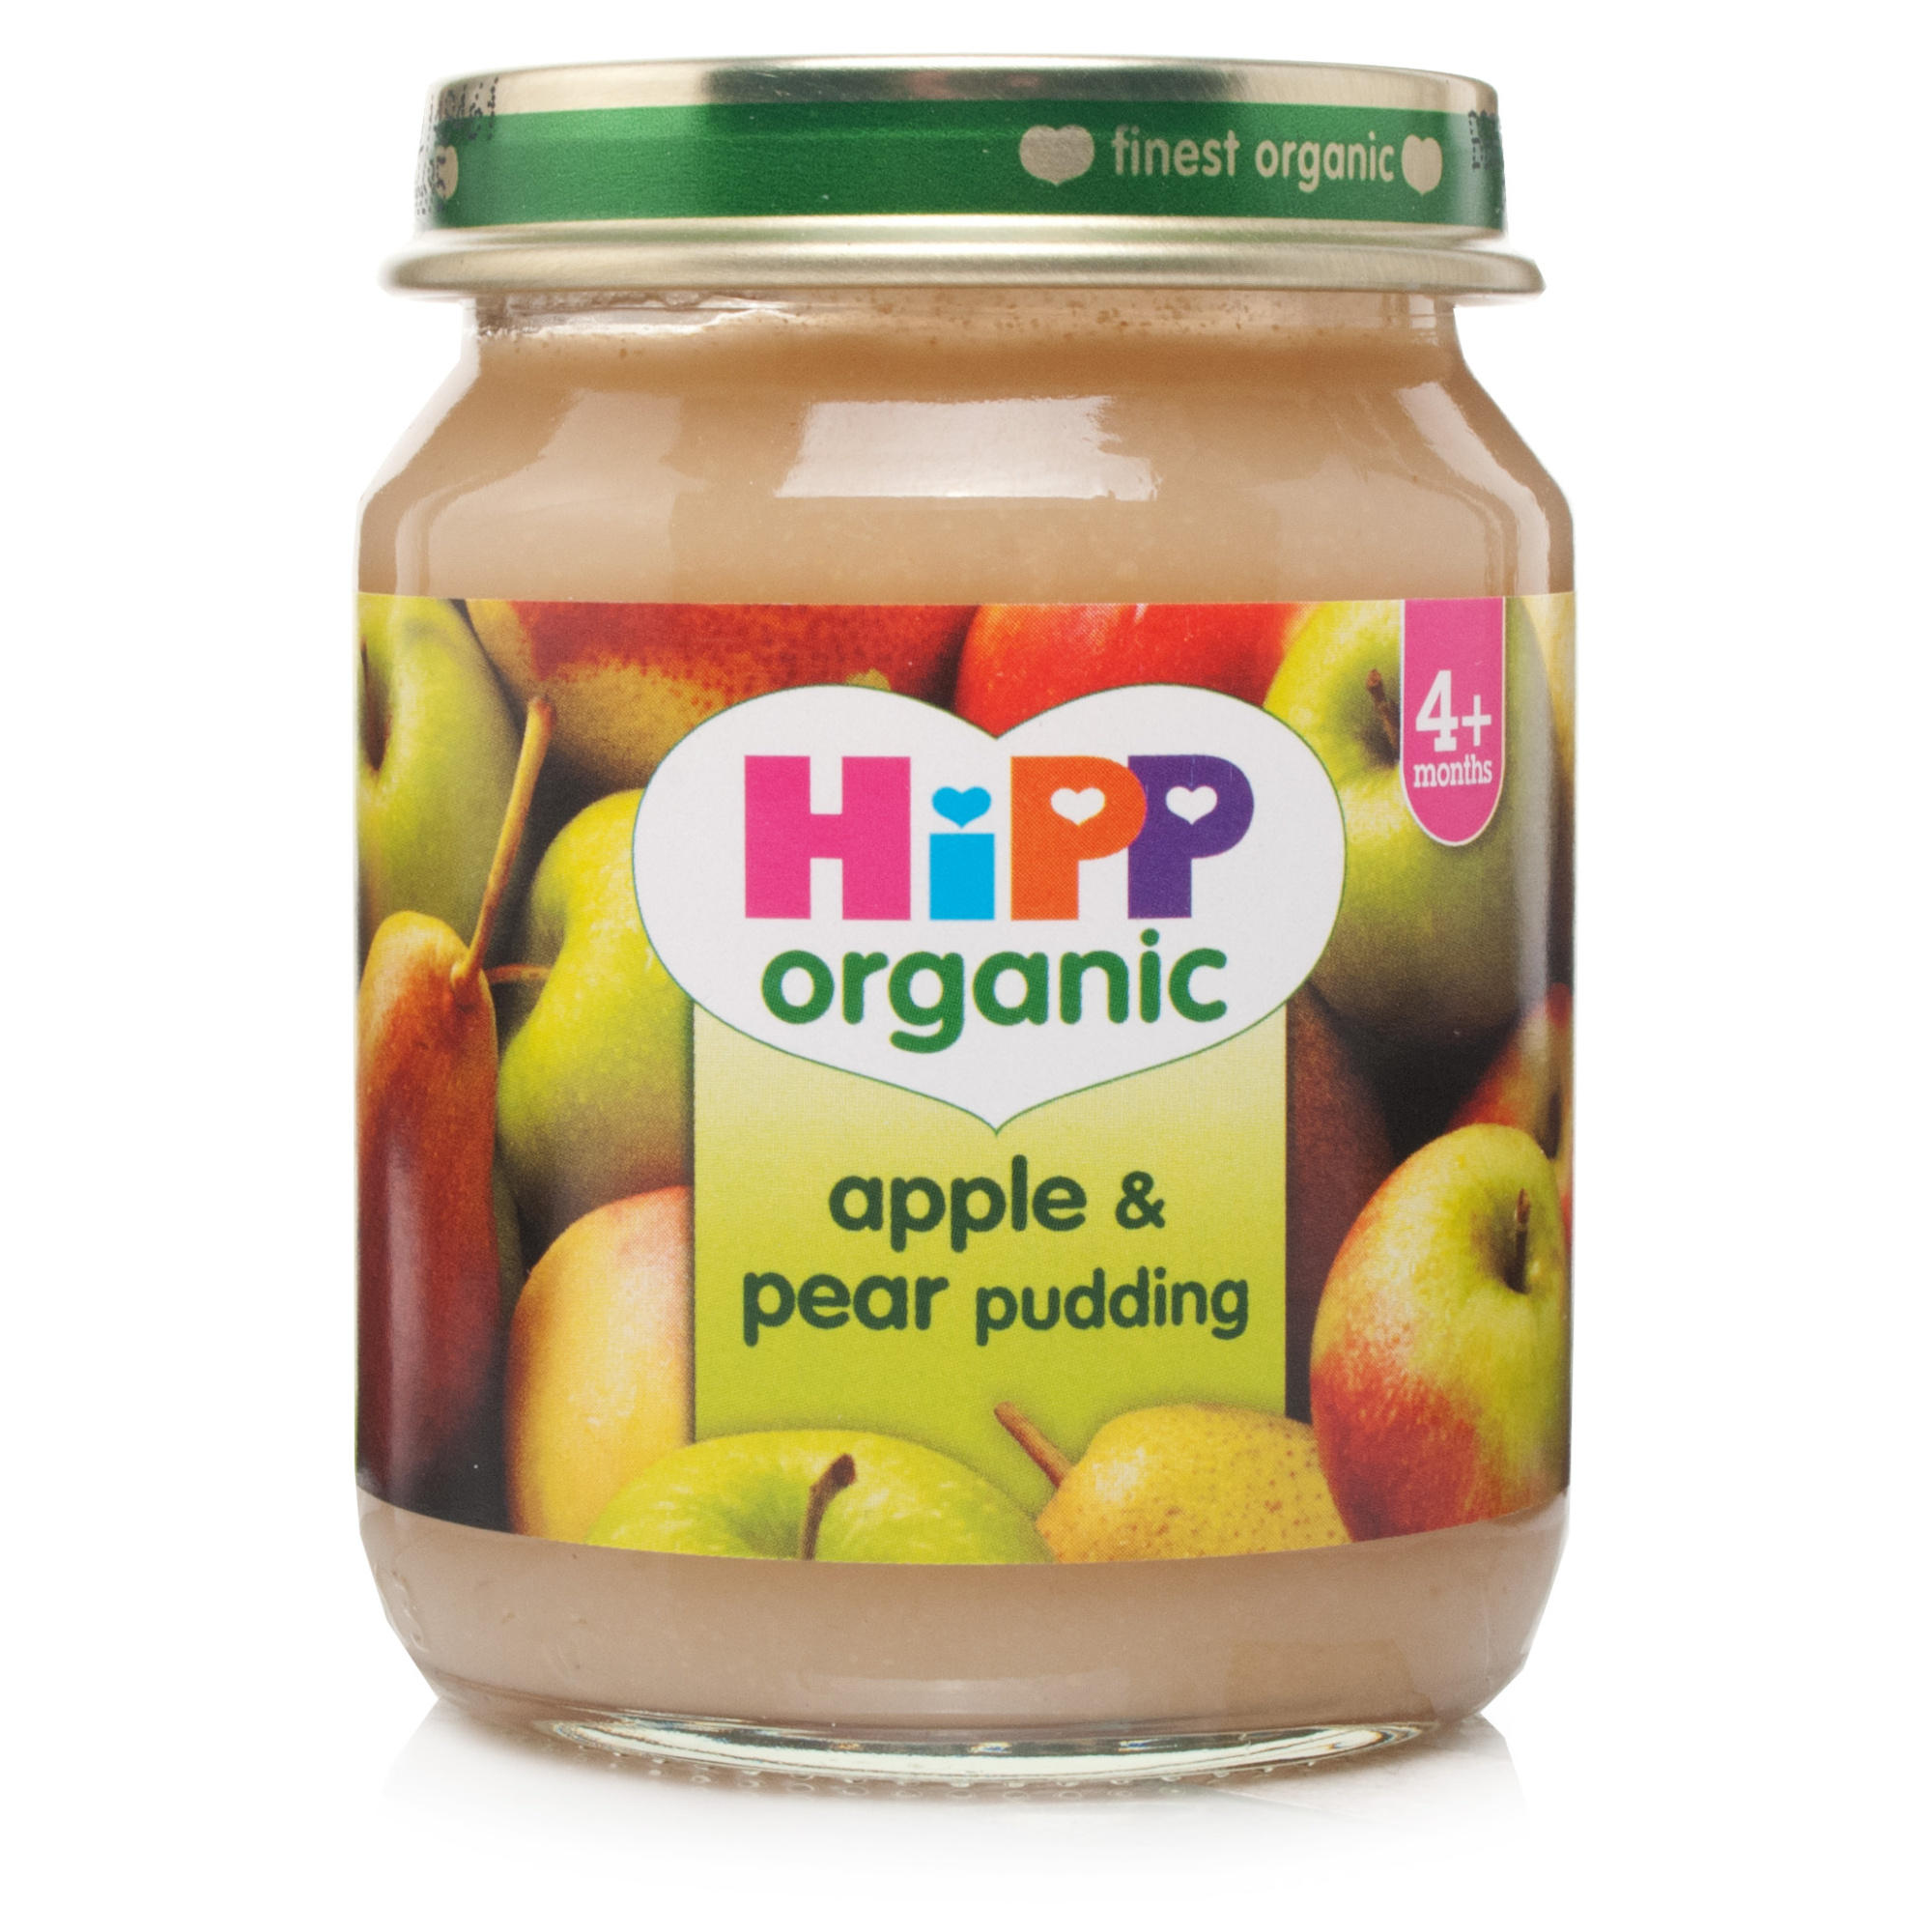 HiPP Stage 1 Organic Apple & Pear Pudding